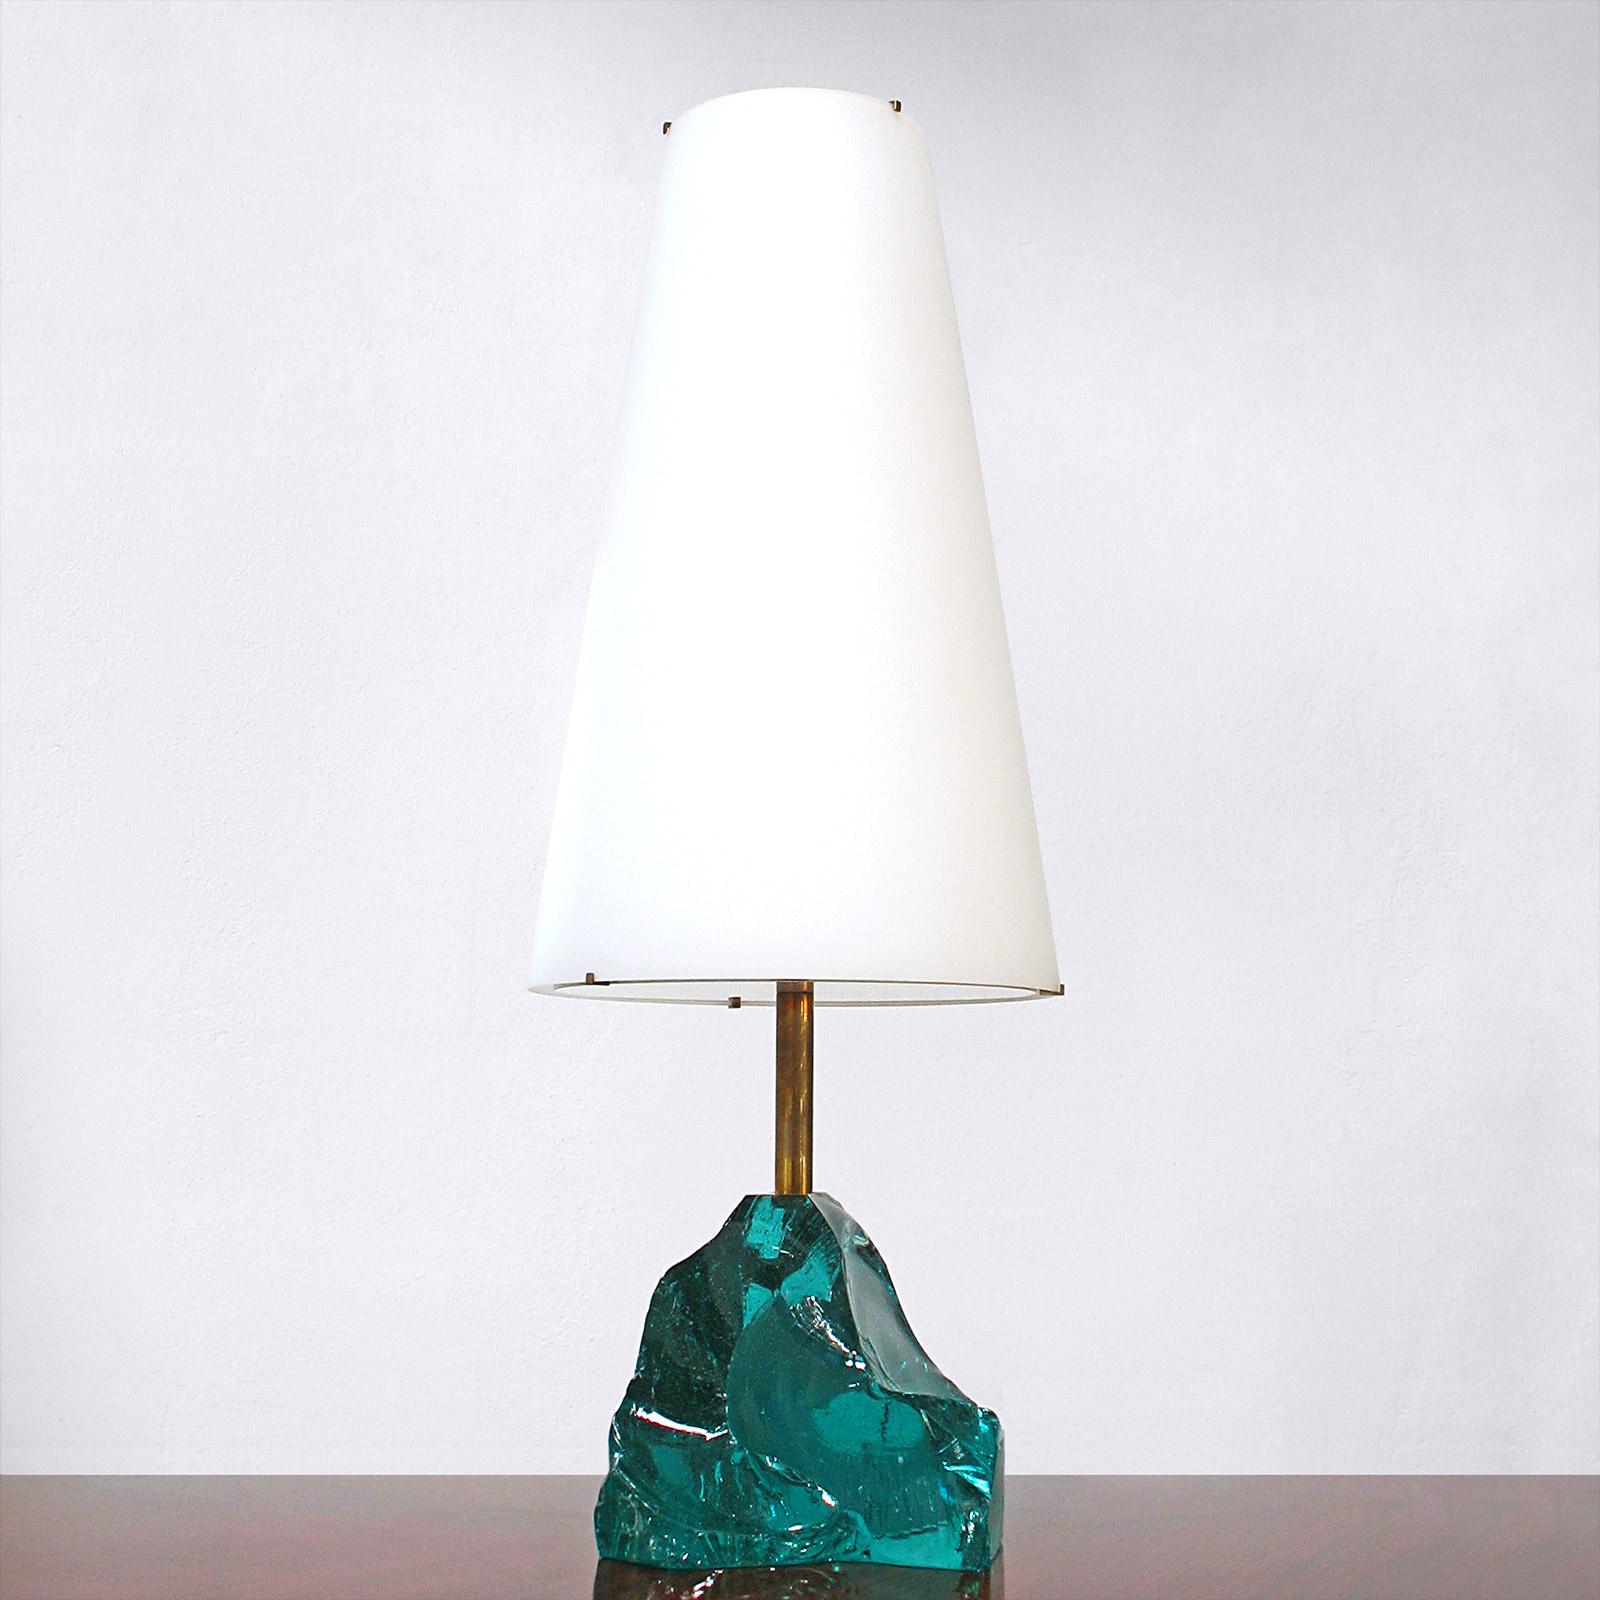 Rock table lamp by roberto rida nicholas alistair for Rock lamp